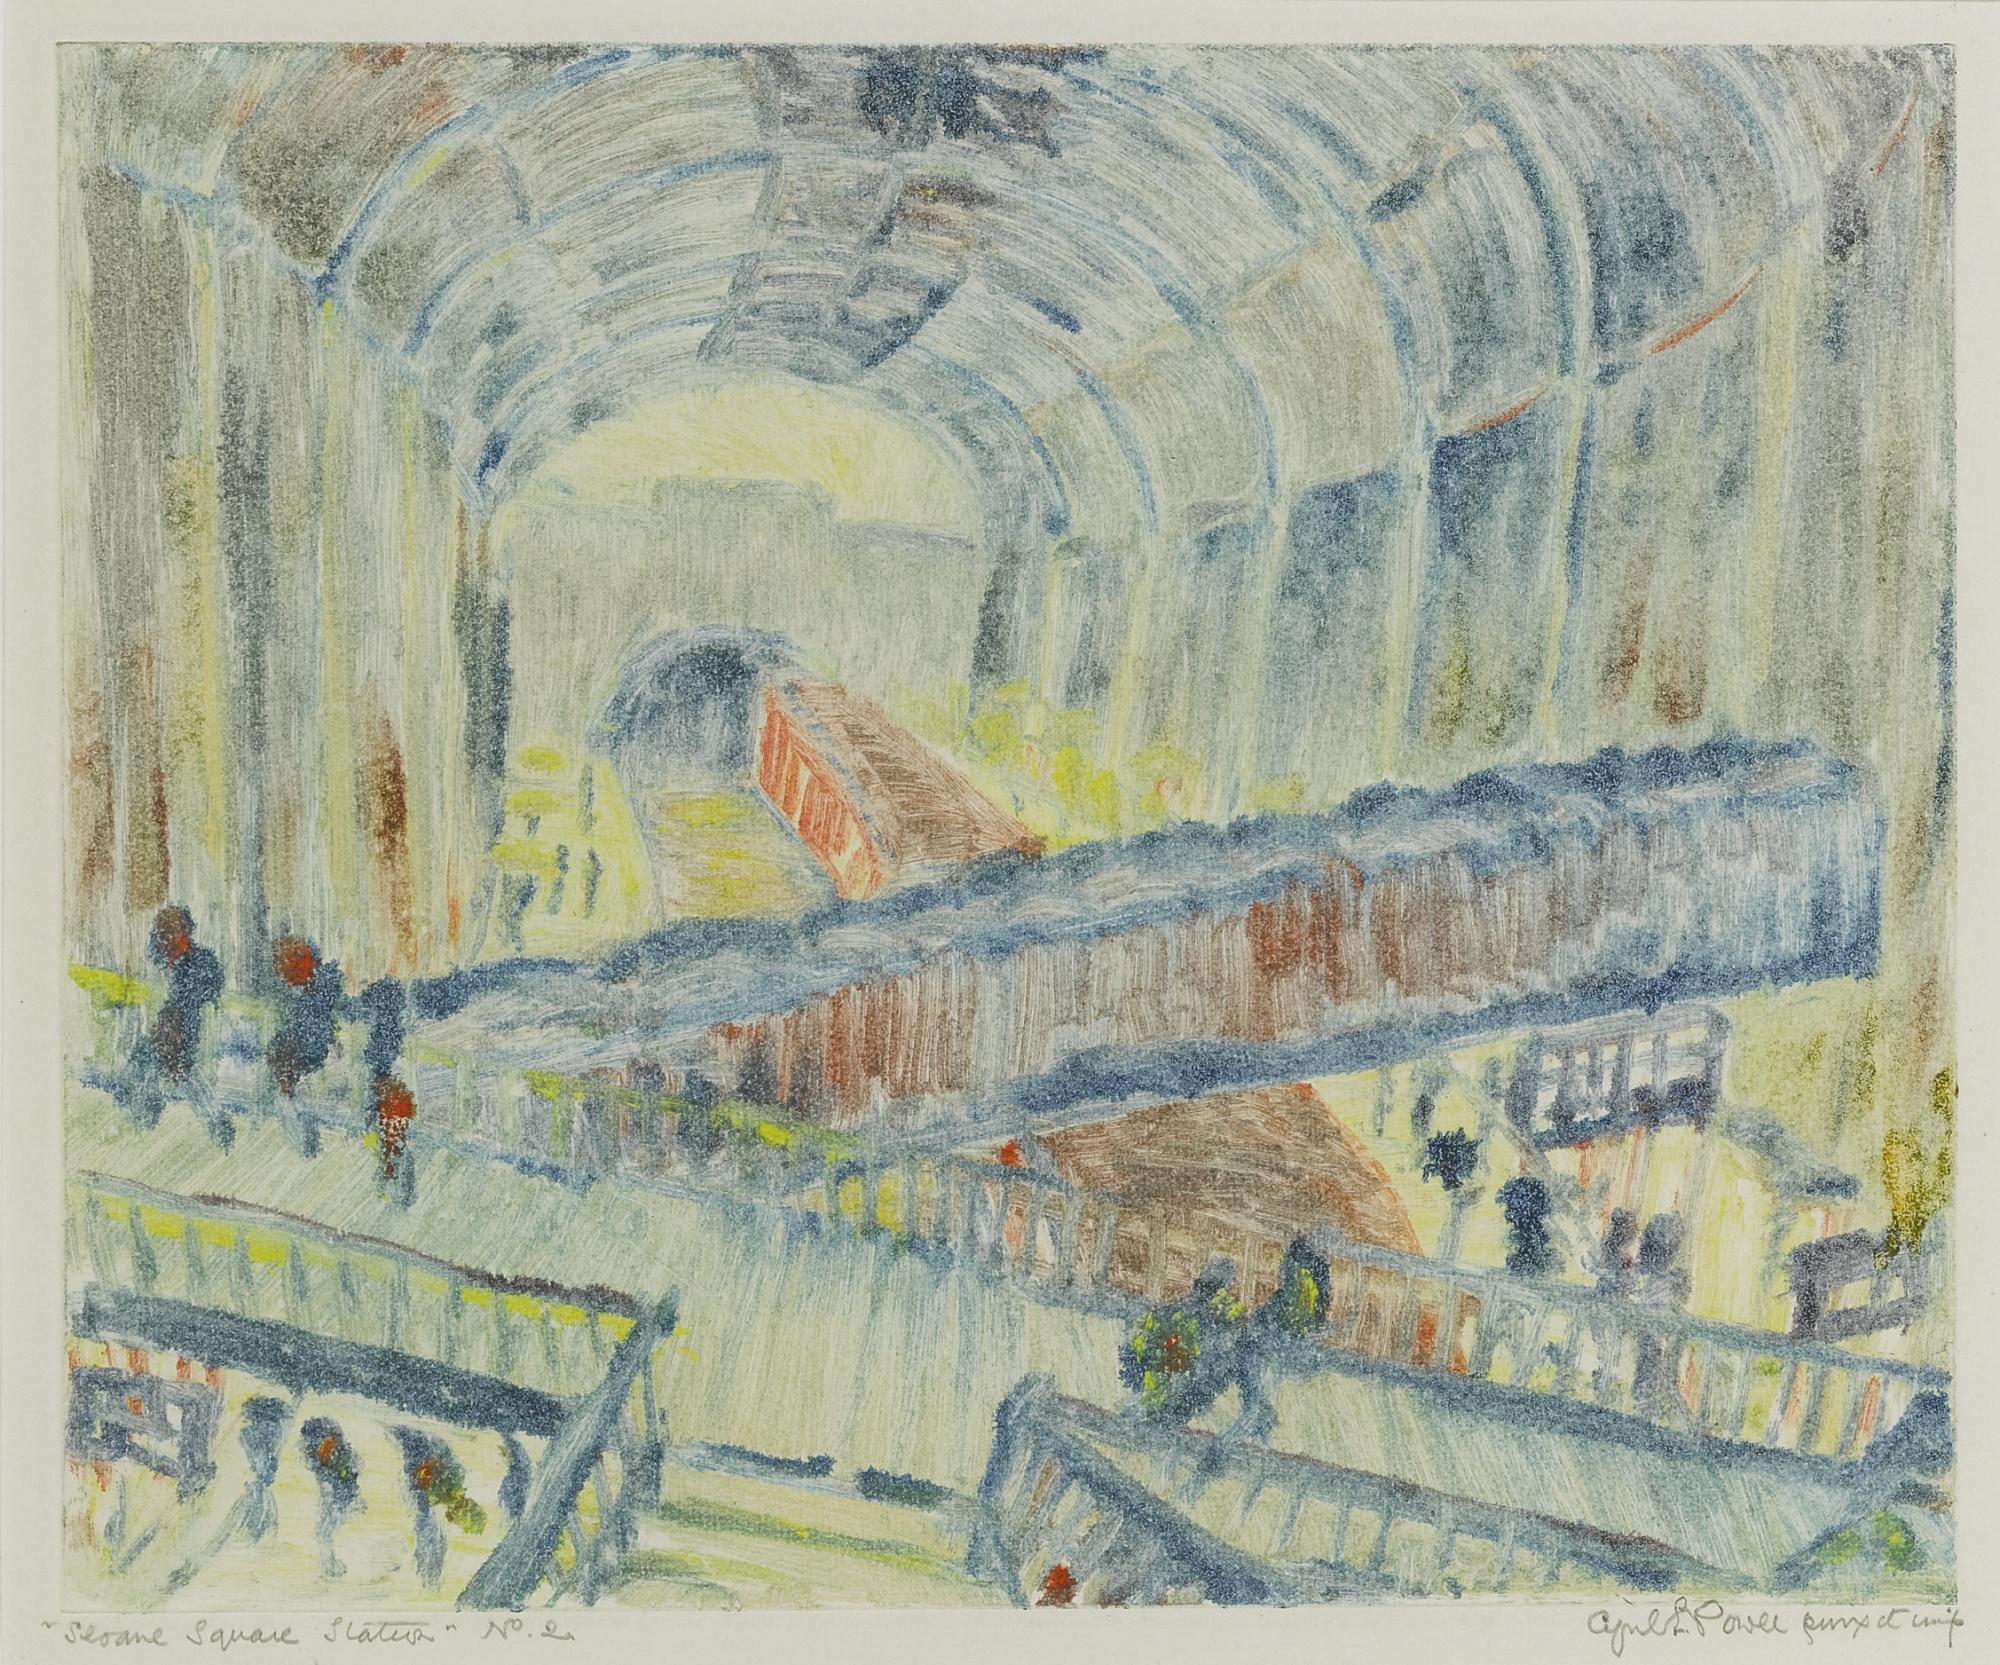 Cyril Edward Power-Sloane Square Station-1932